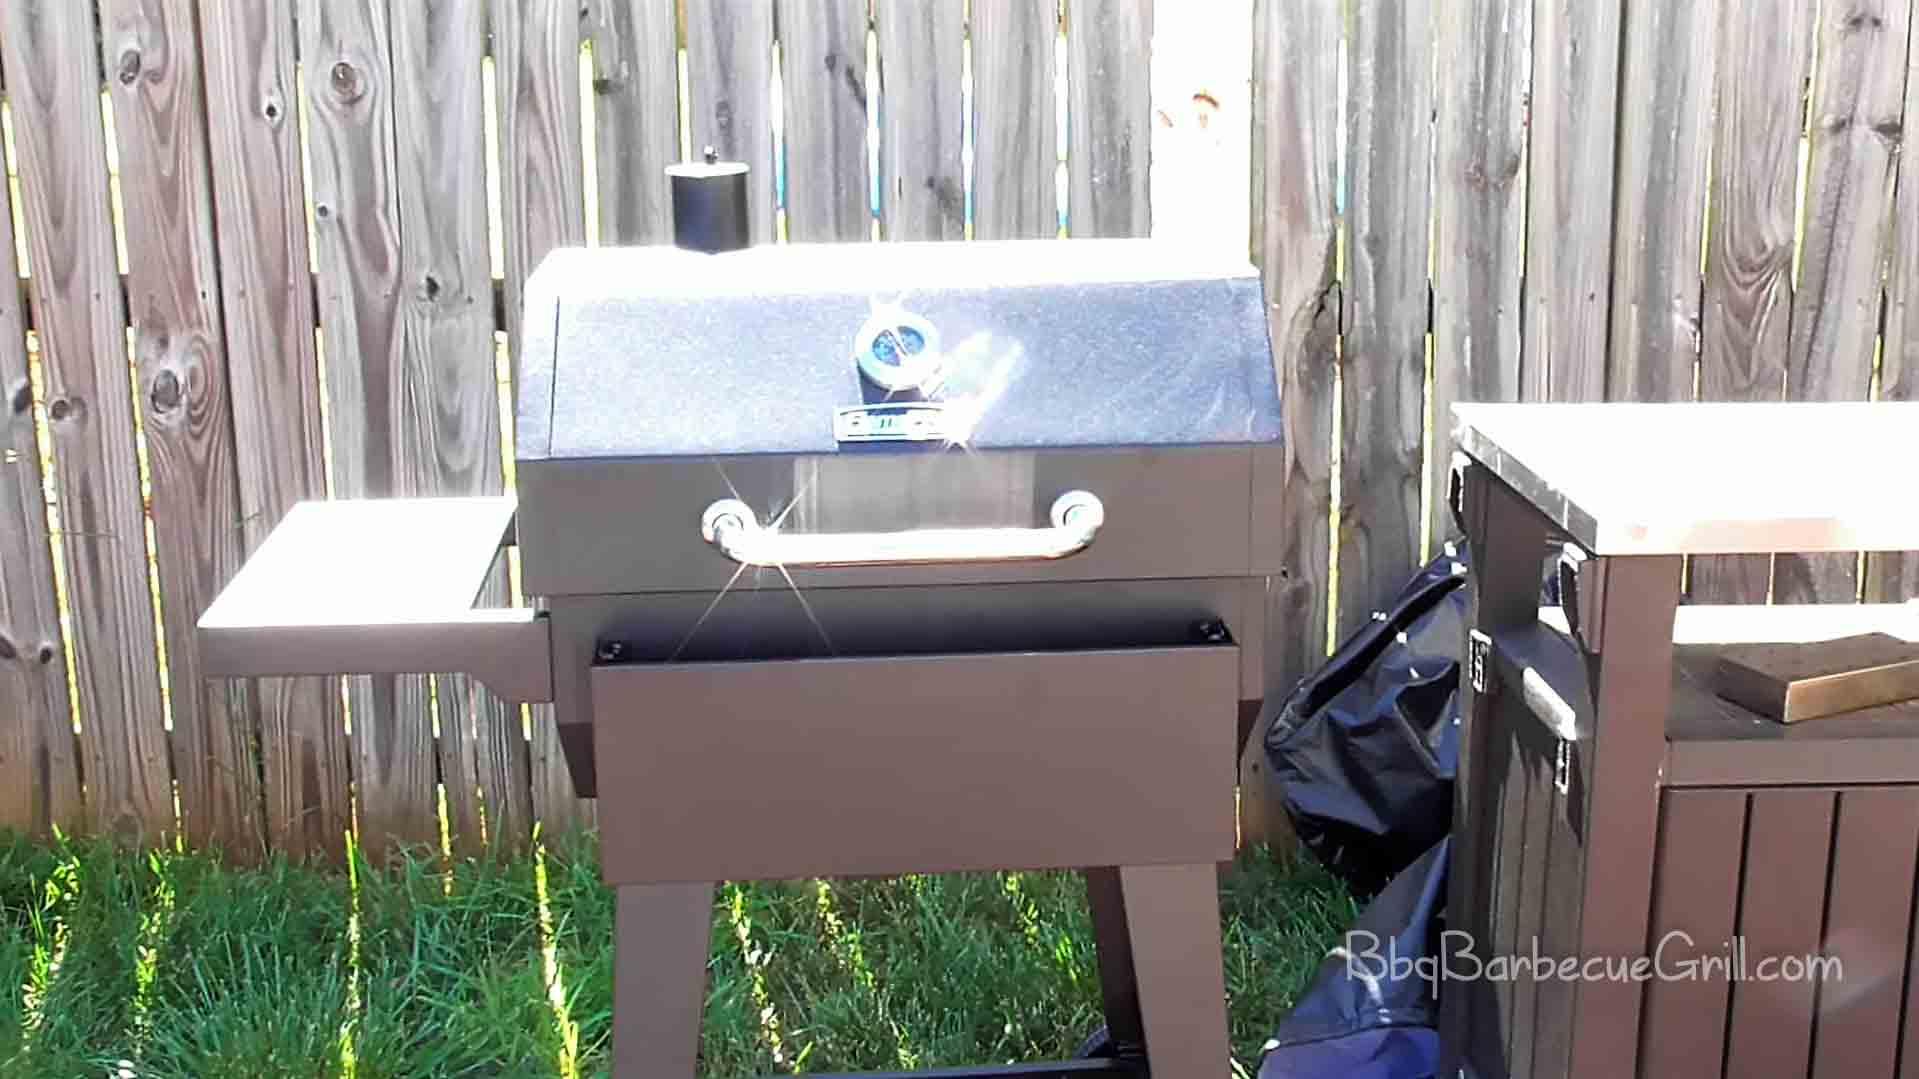 Best bbq pro charcoal grill